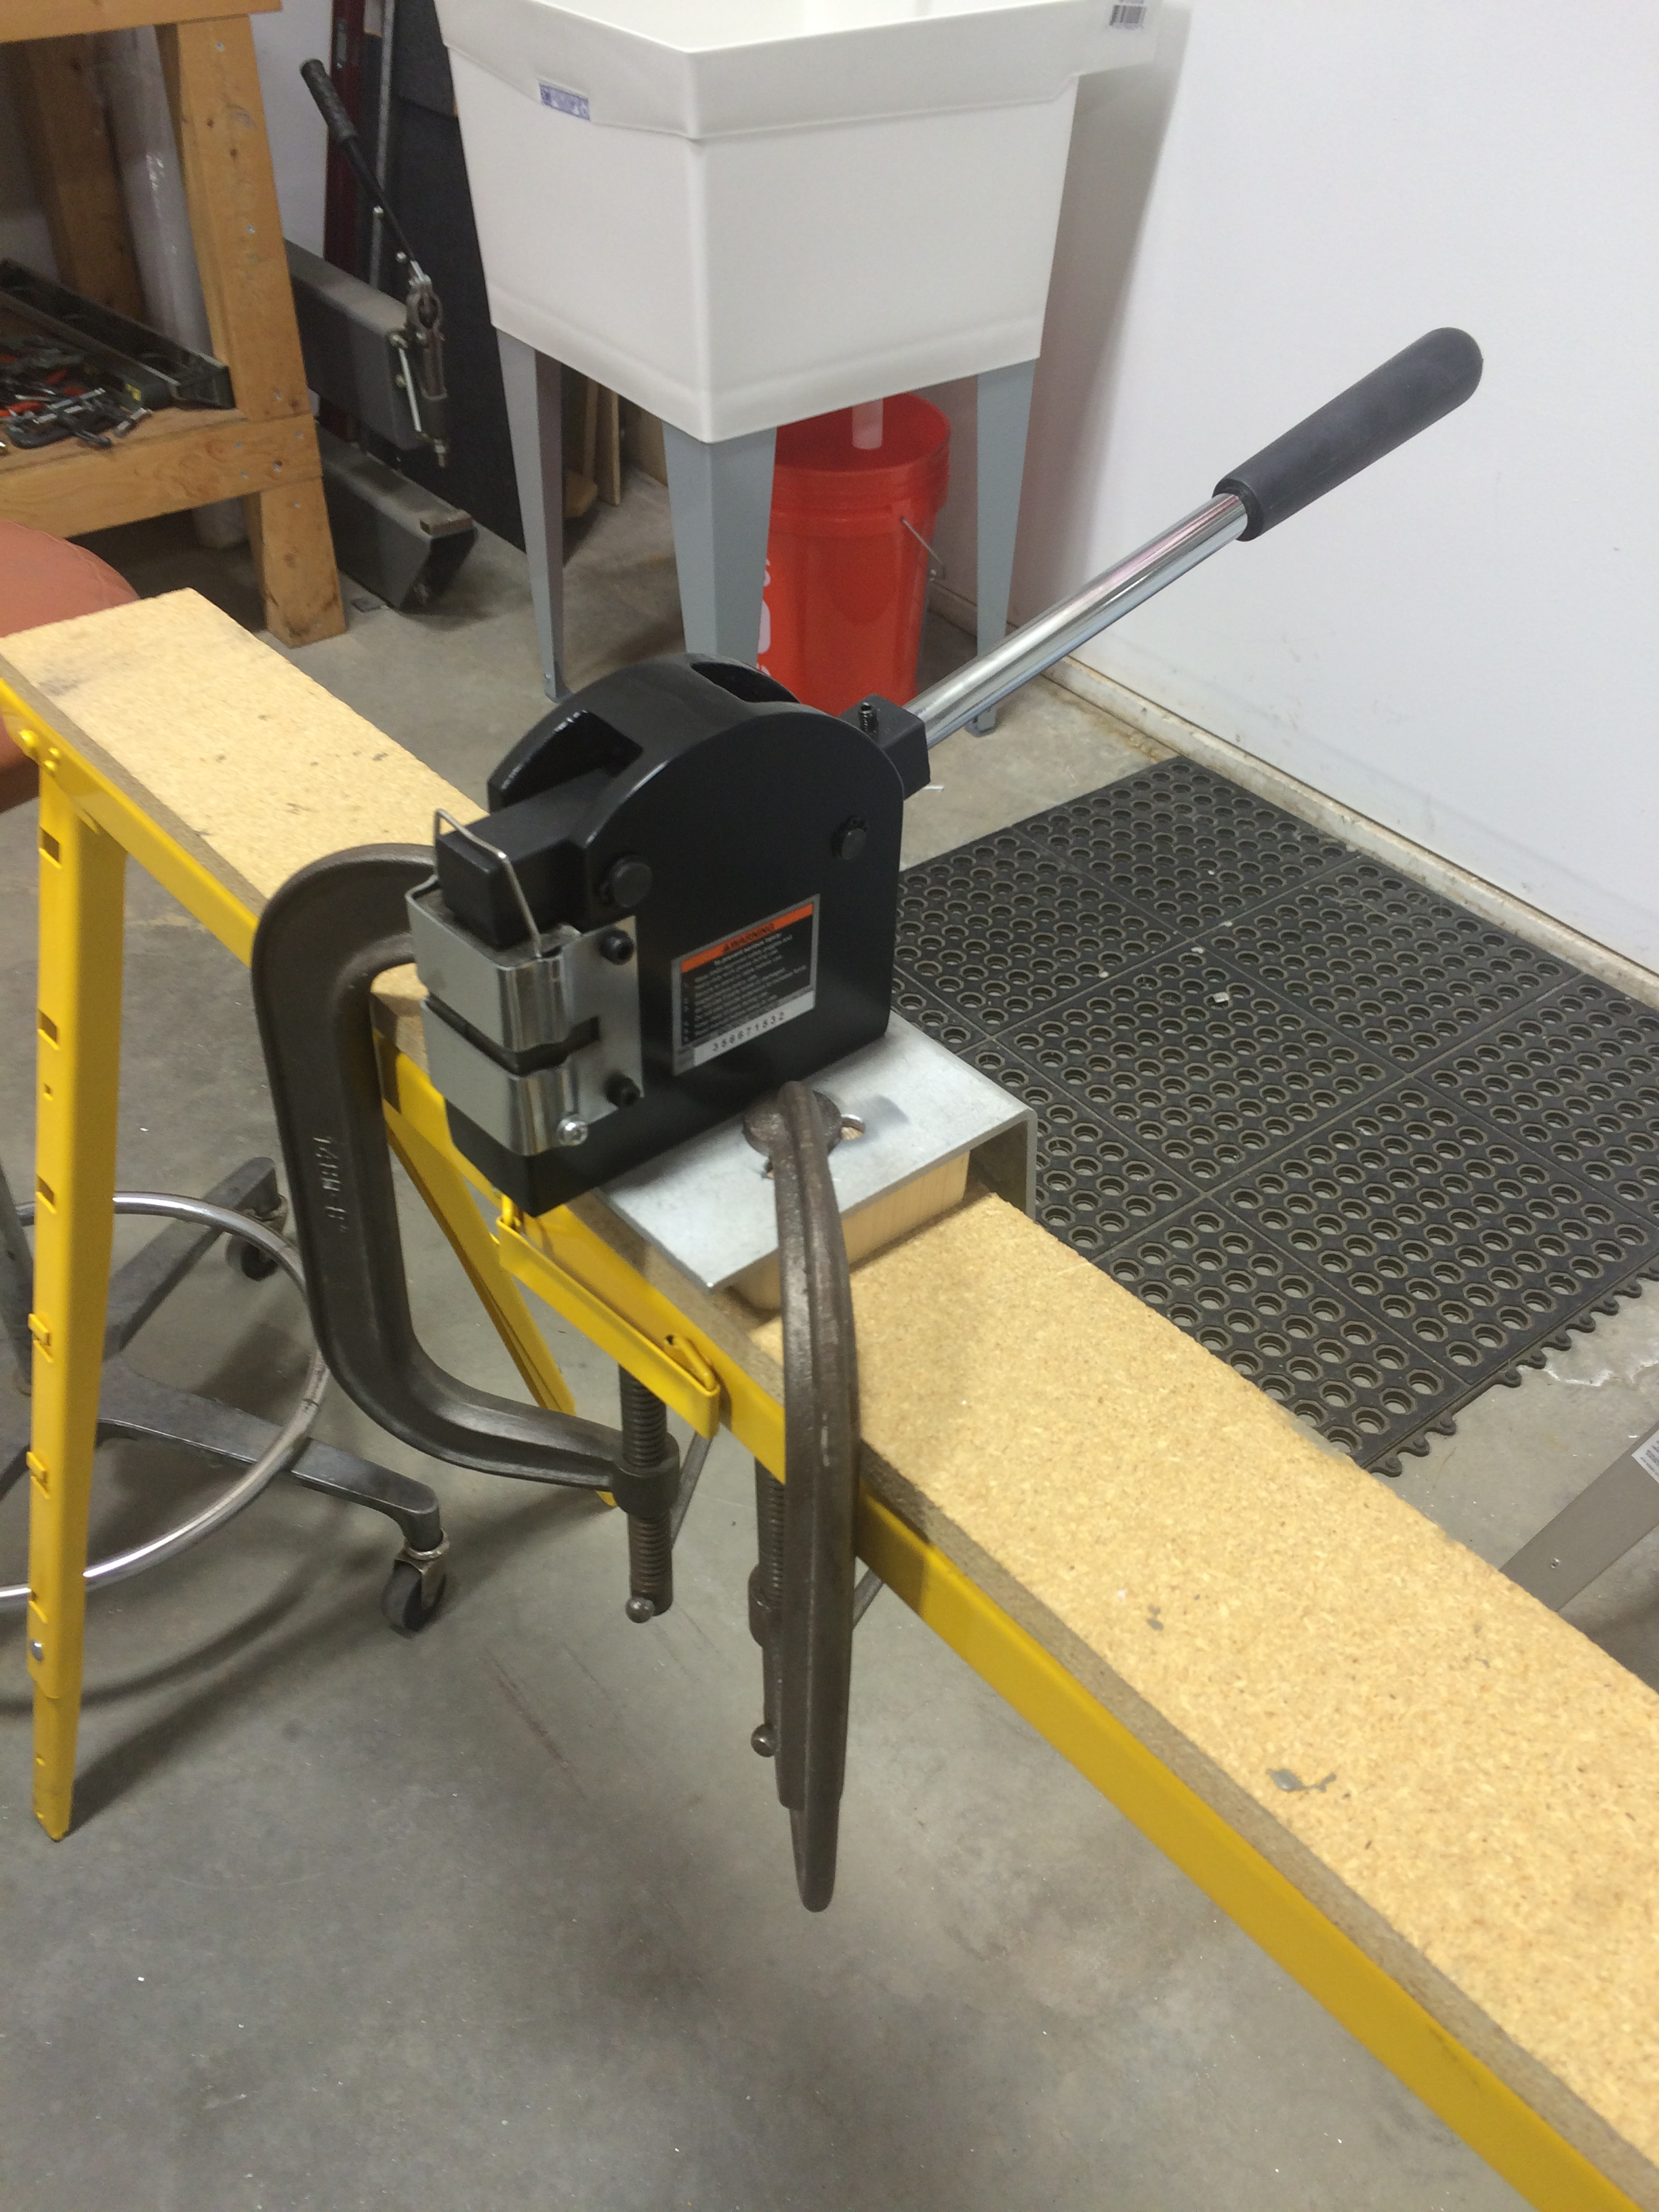 Metal shrinker in use